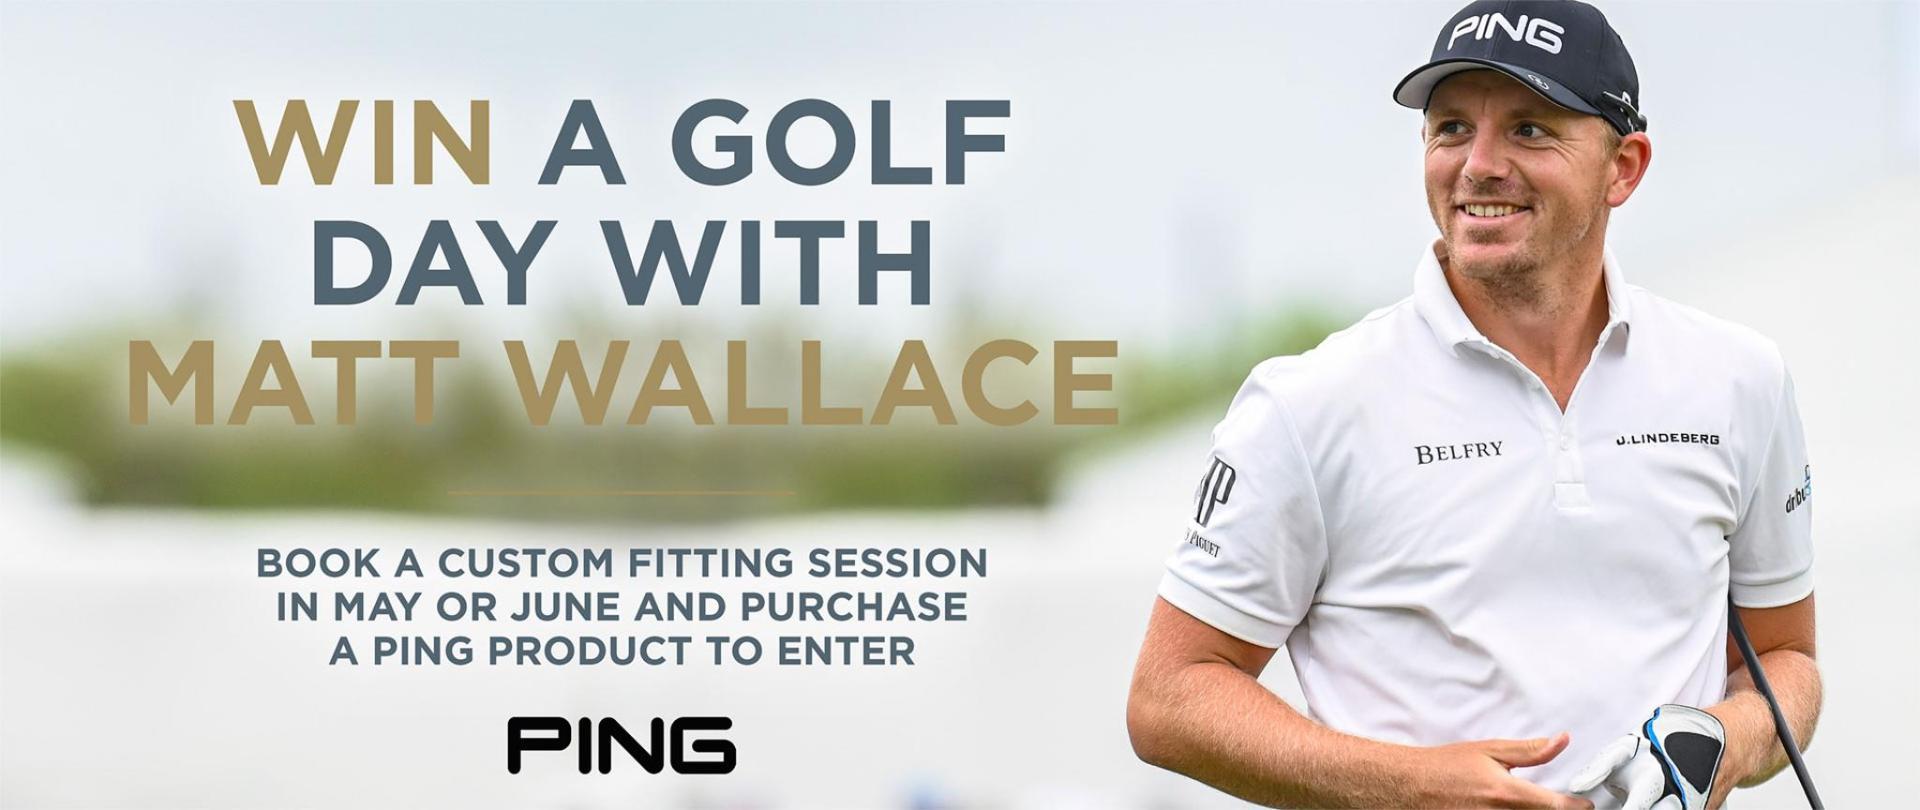 Golf-Ping-Offer-Homepage-1920x810.jpg